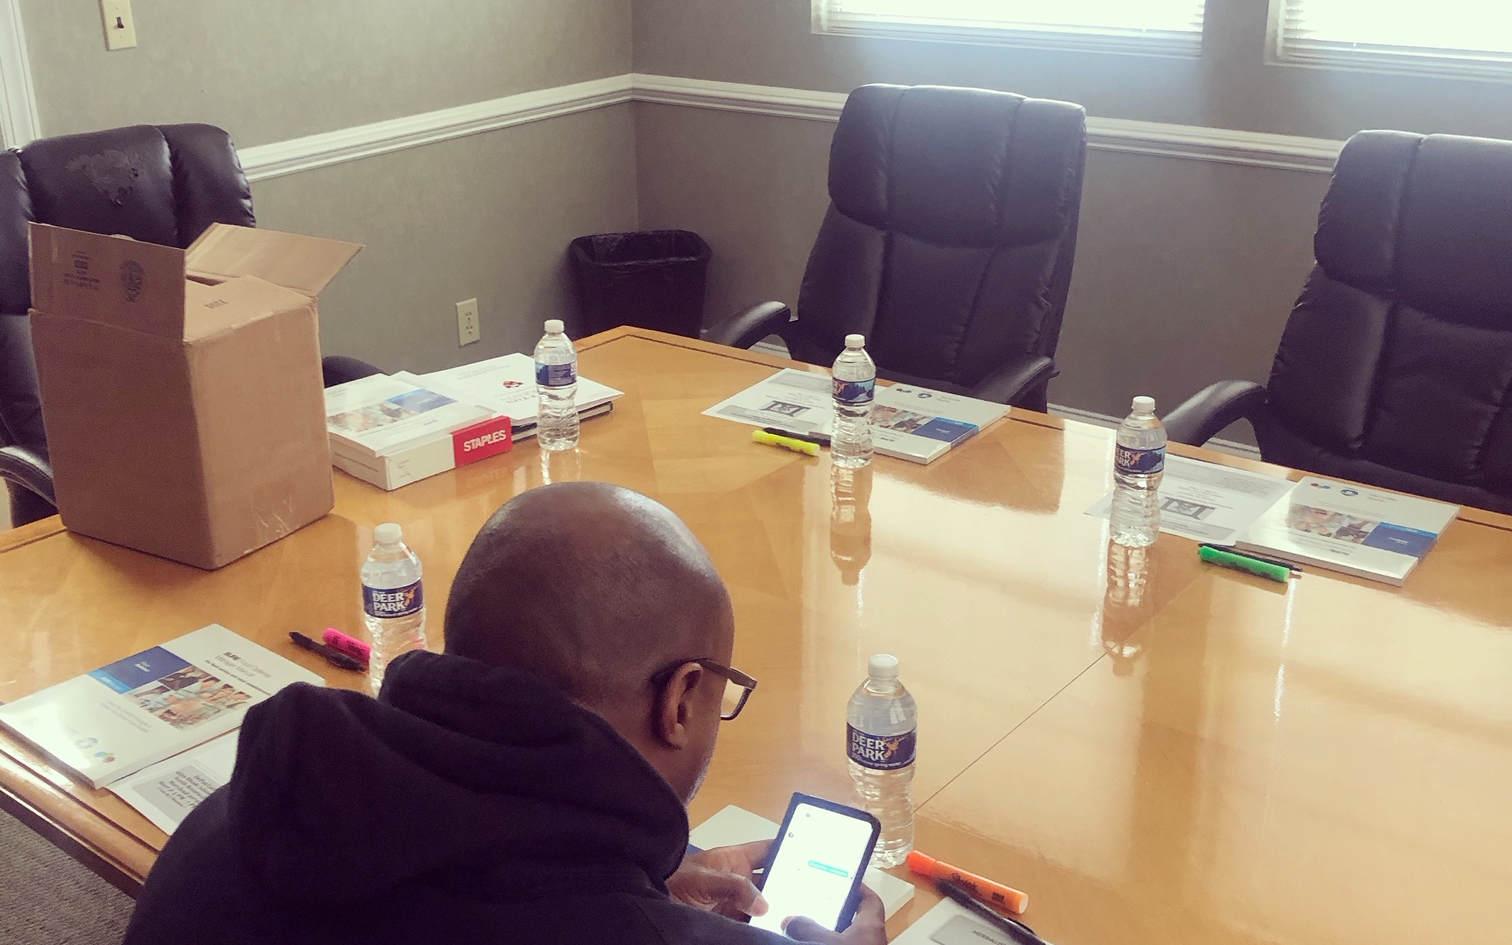 Mater Class: Cannabis Bio2Defense Manager's 2019-2020